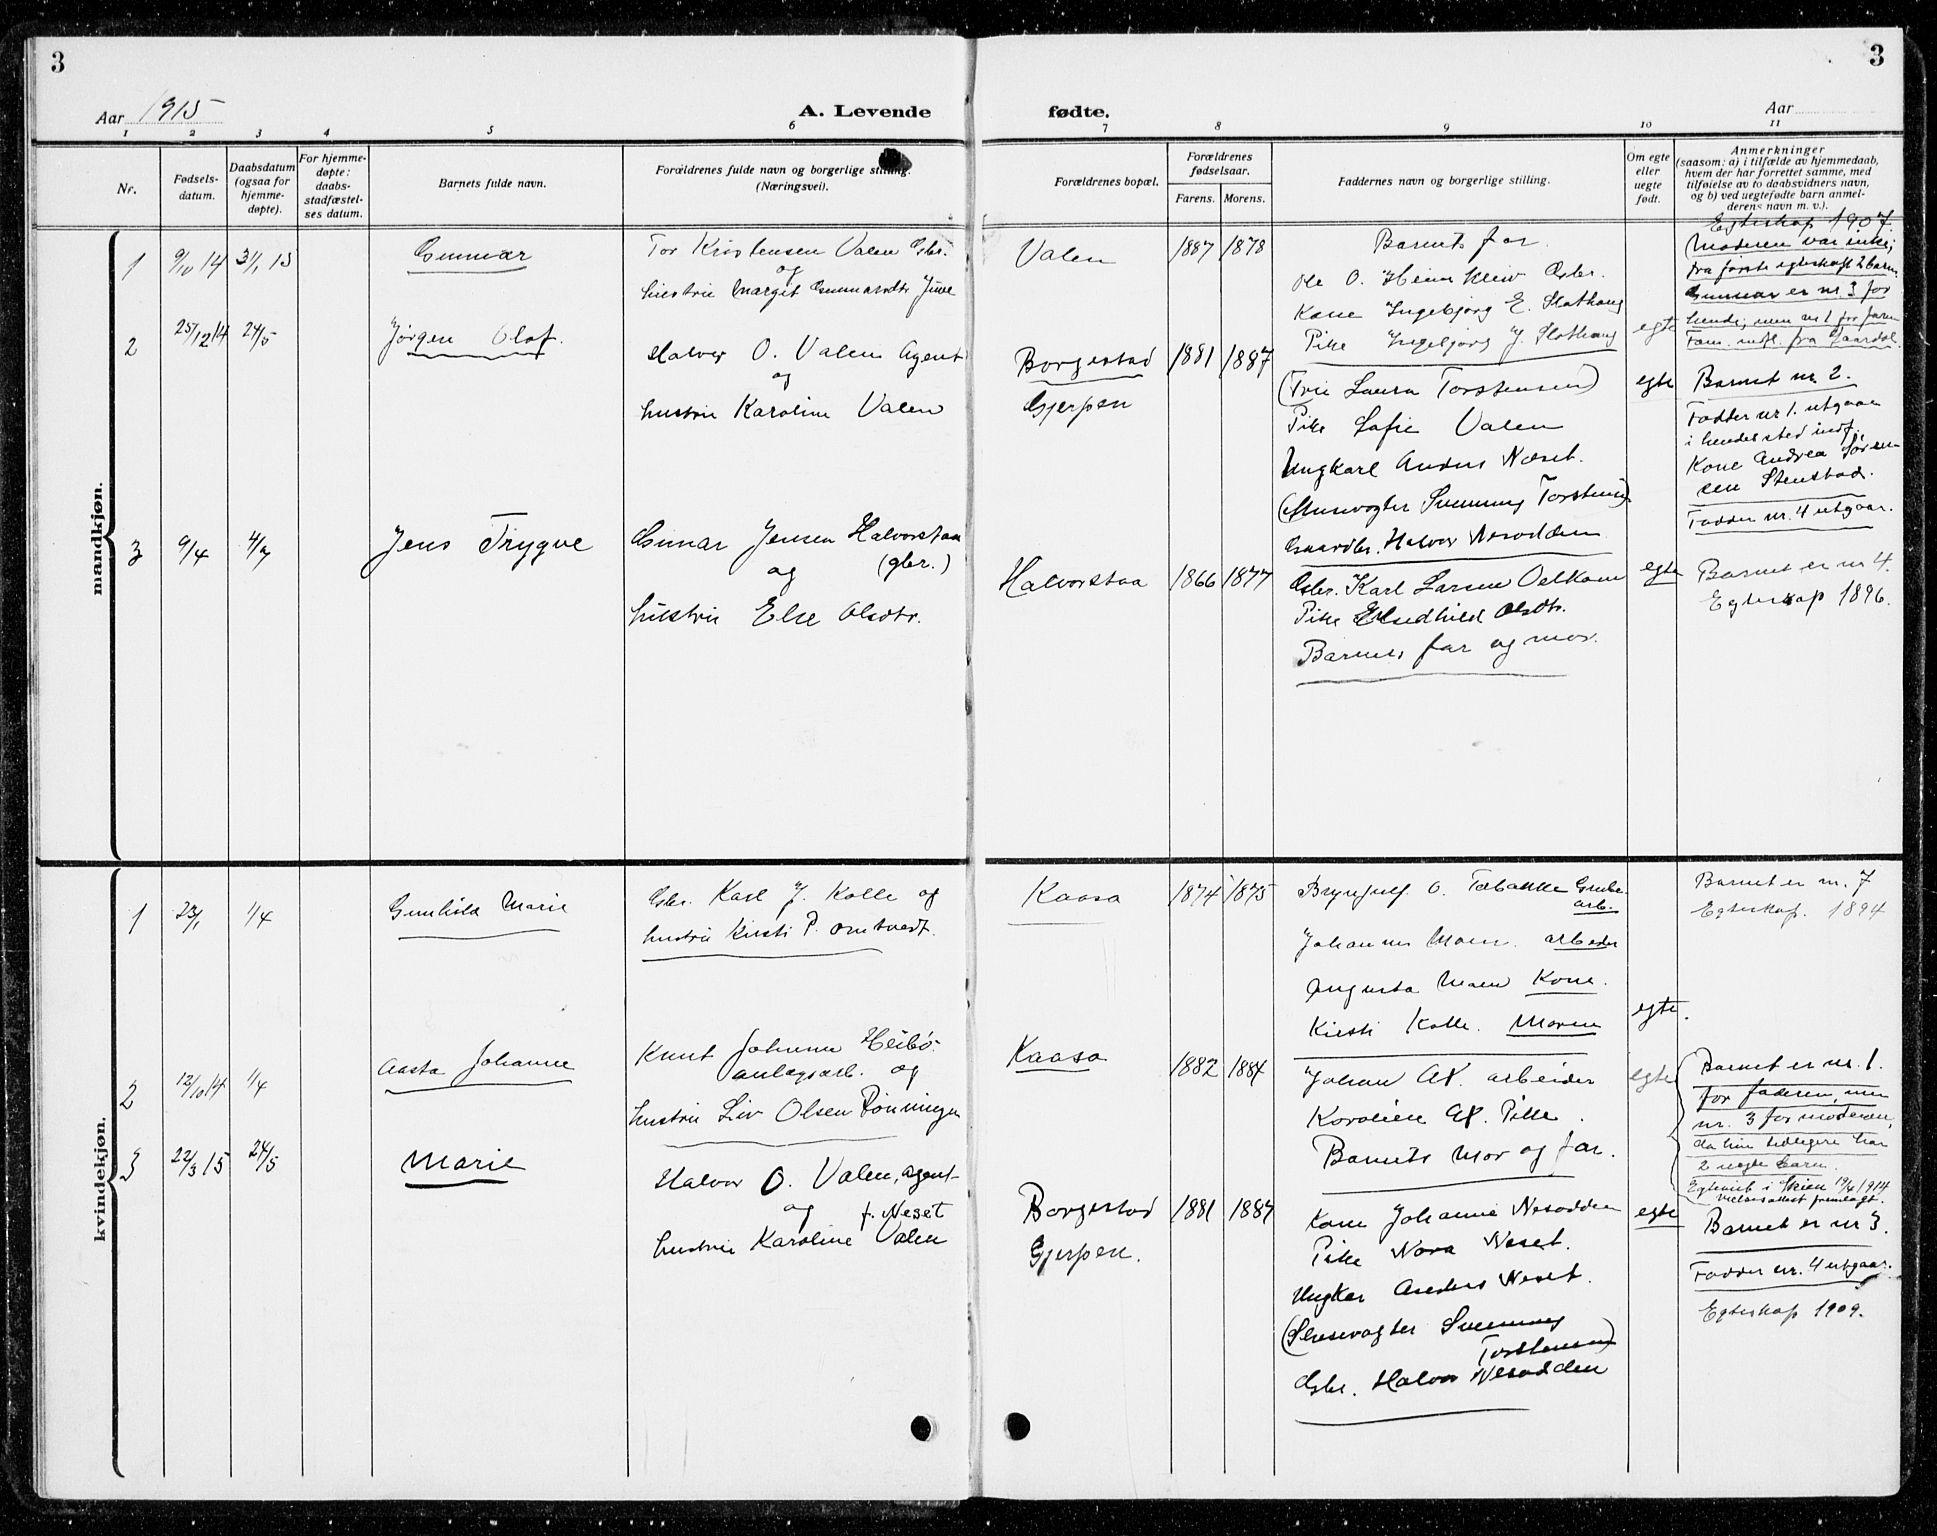 SAKO, Holla kirkebøker, G/Gb/L0003: Klokkerbok nr. II 3, 1914-1941, s. 3